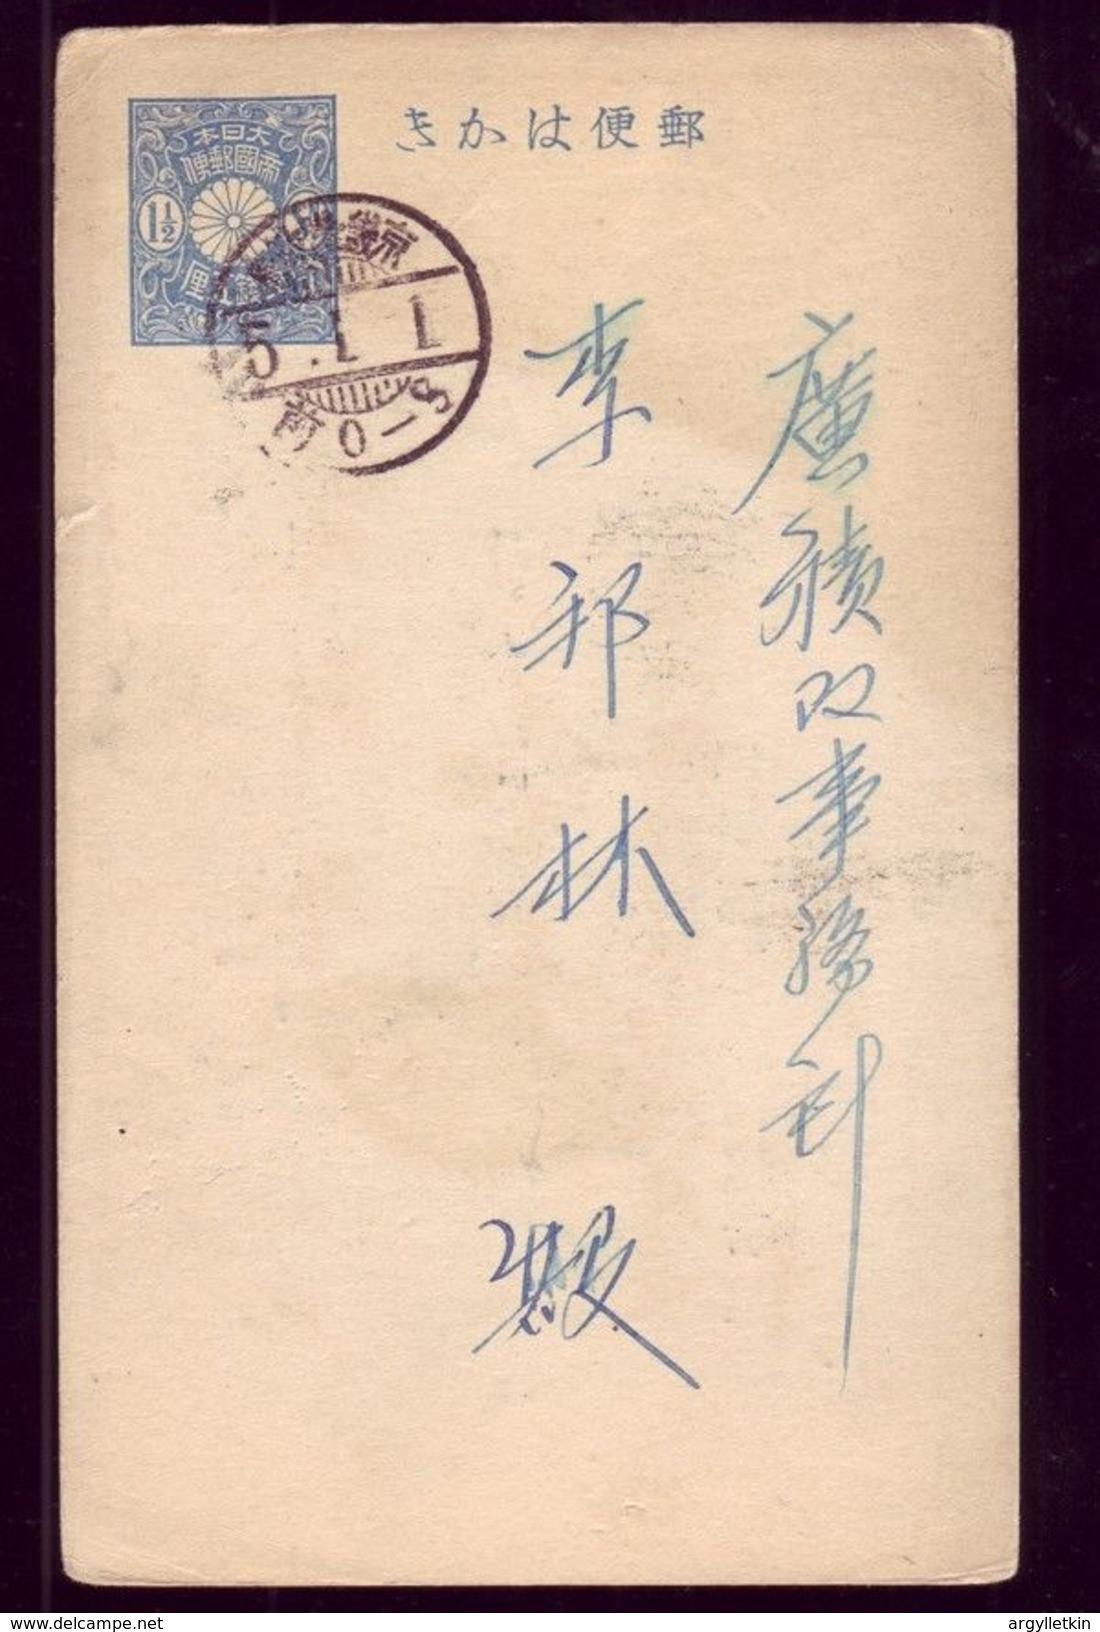 KOREA/JAPAN STATIONERY KYONGI WE JONG BU - Korea (...-1945)